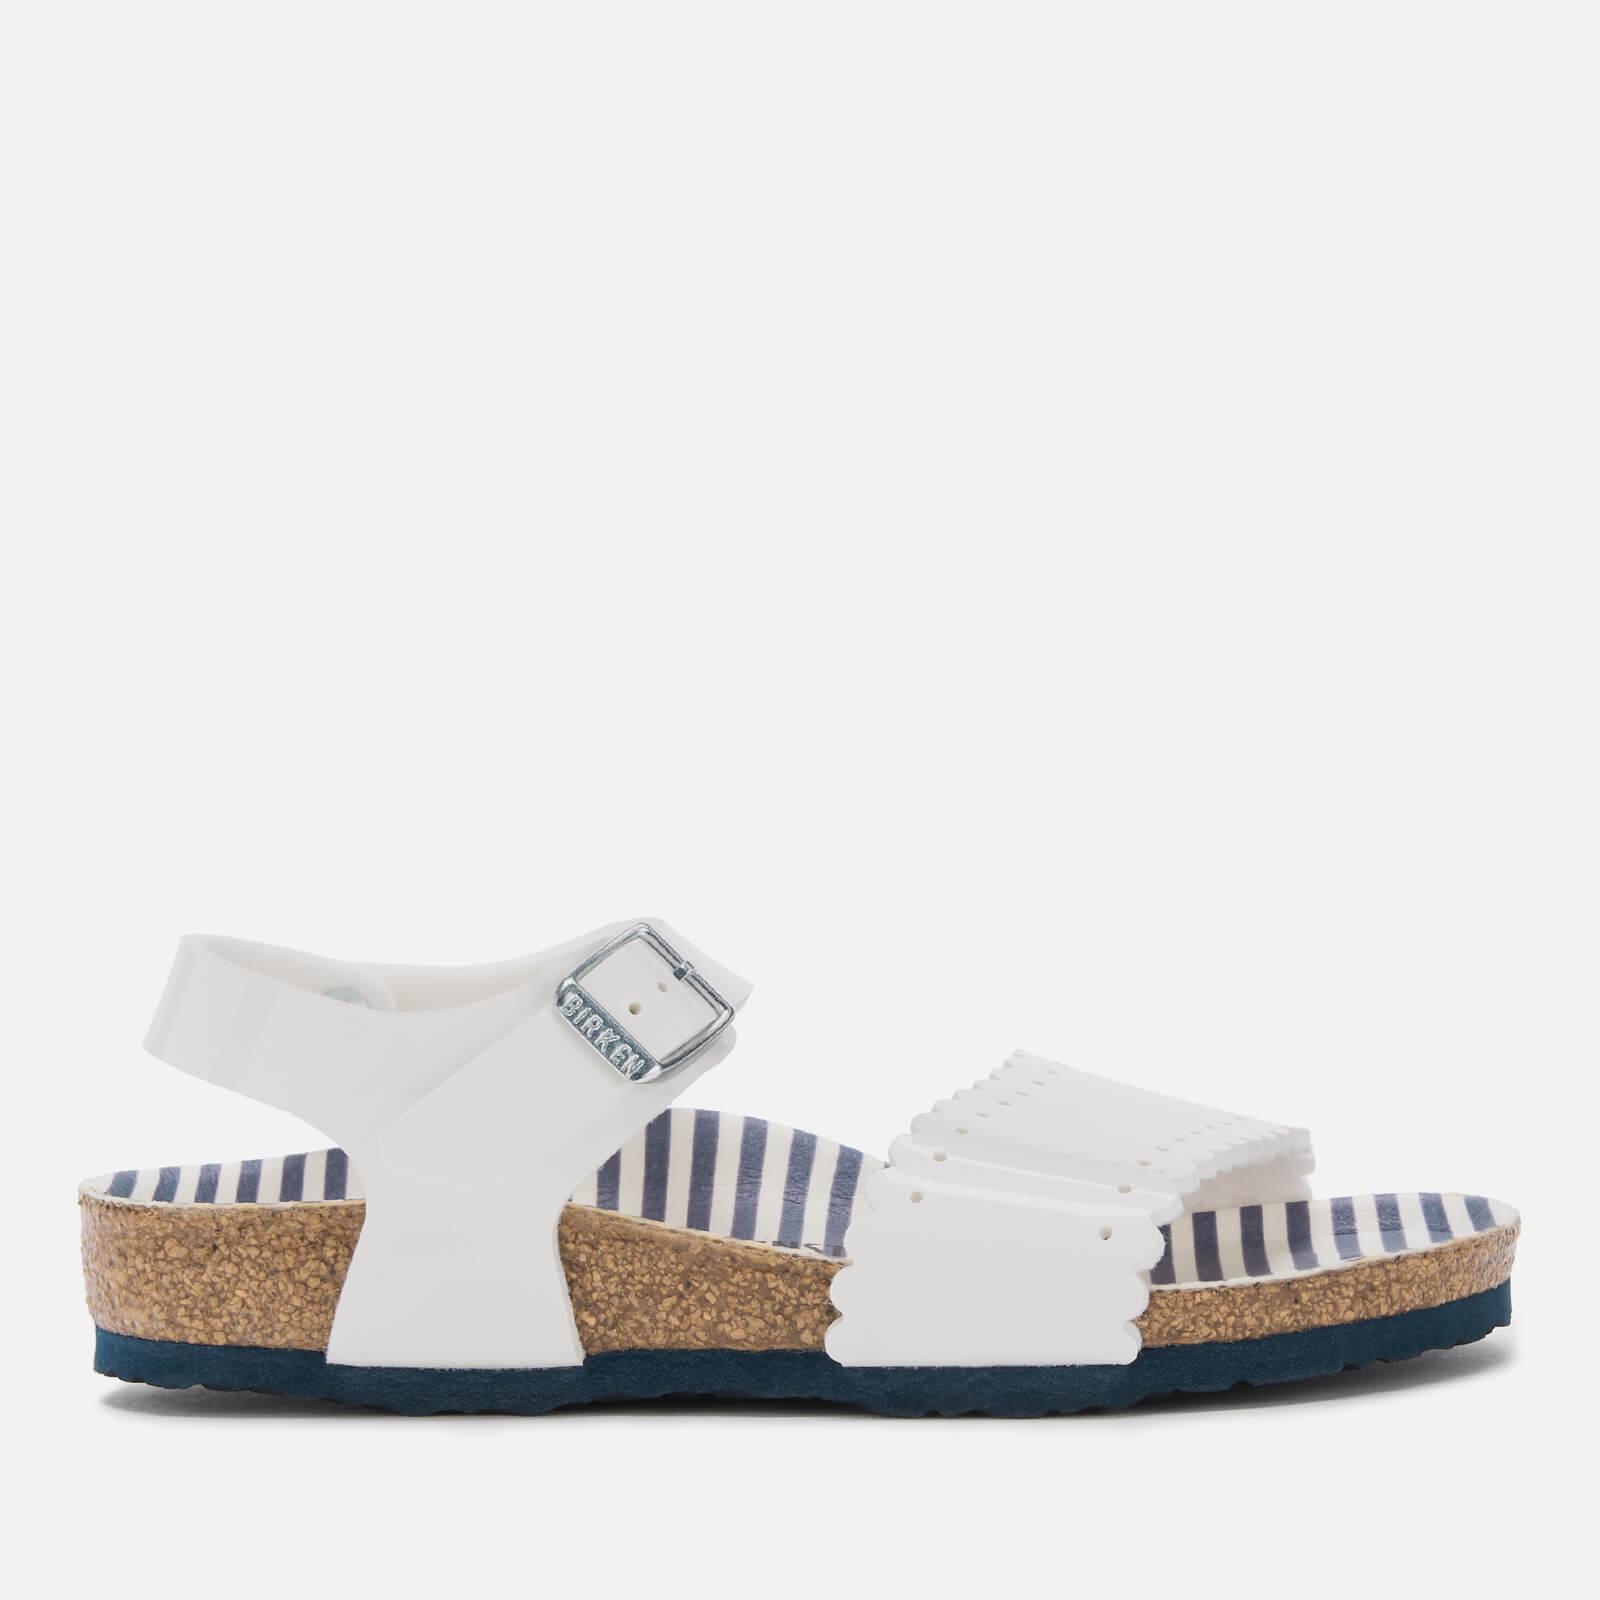 Birkenstock Kids' Risa Slim Fit Patent Double Strap Sandals - Nautical Stripes White - EU 32/UK 13.5